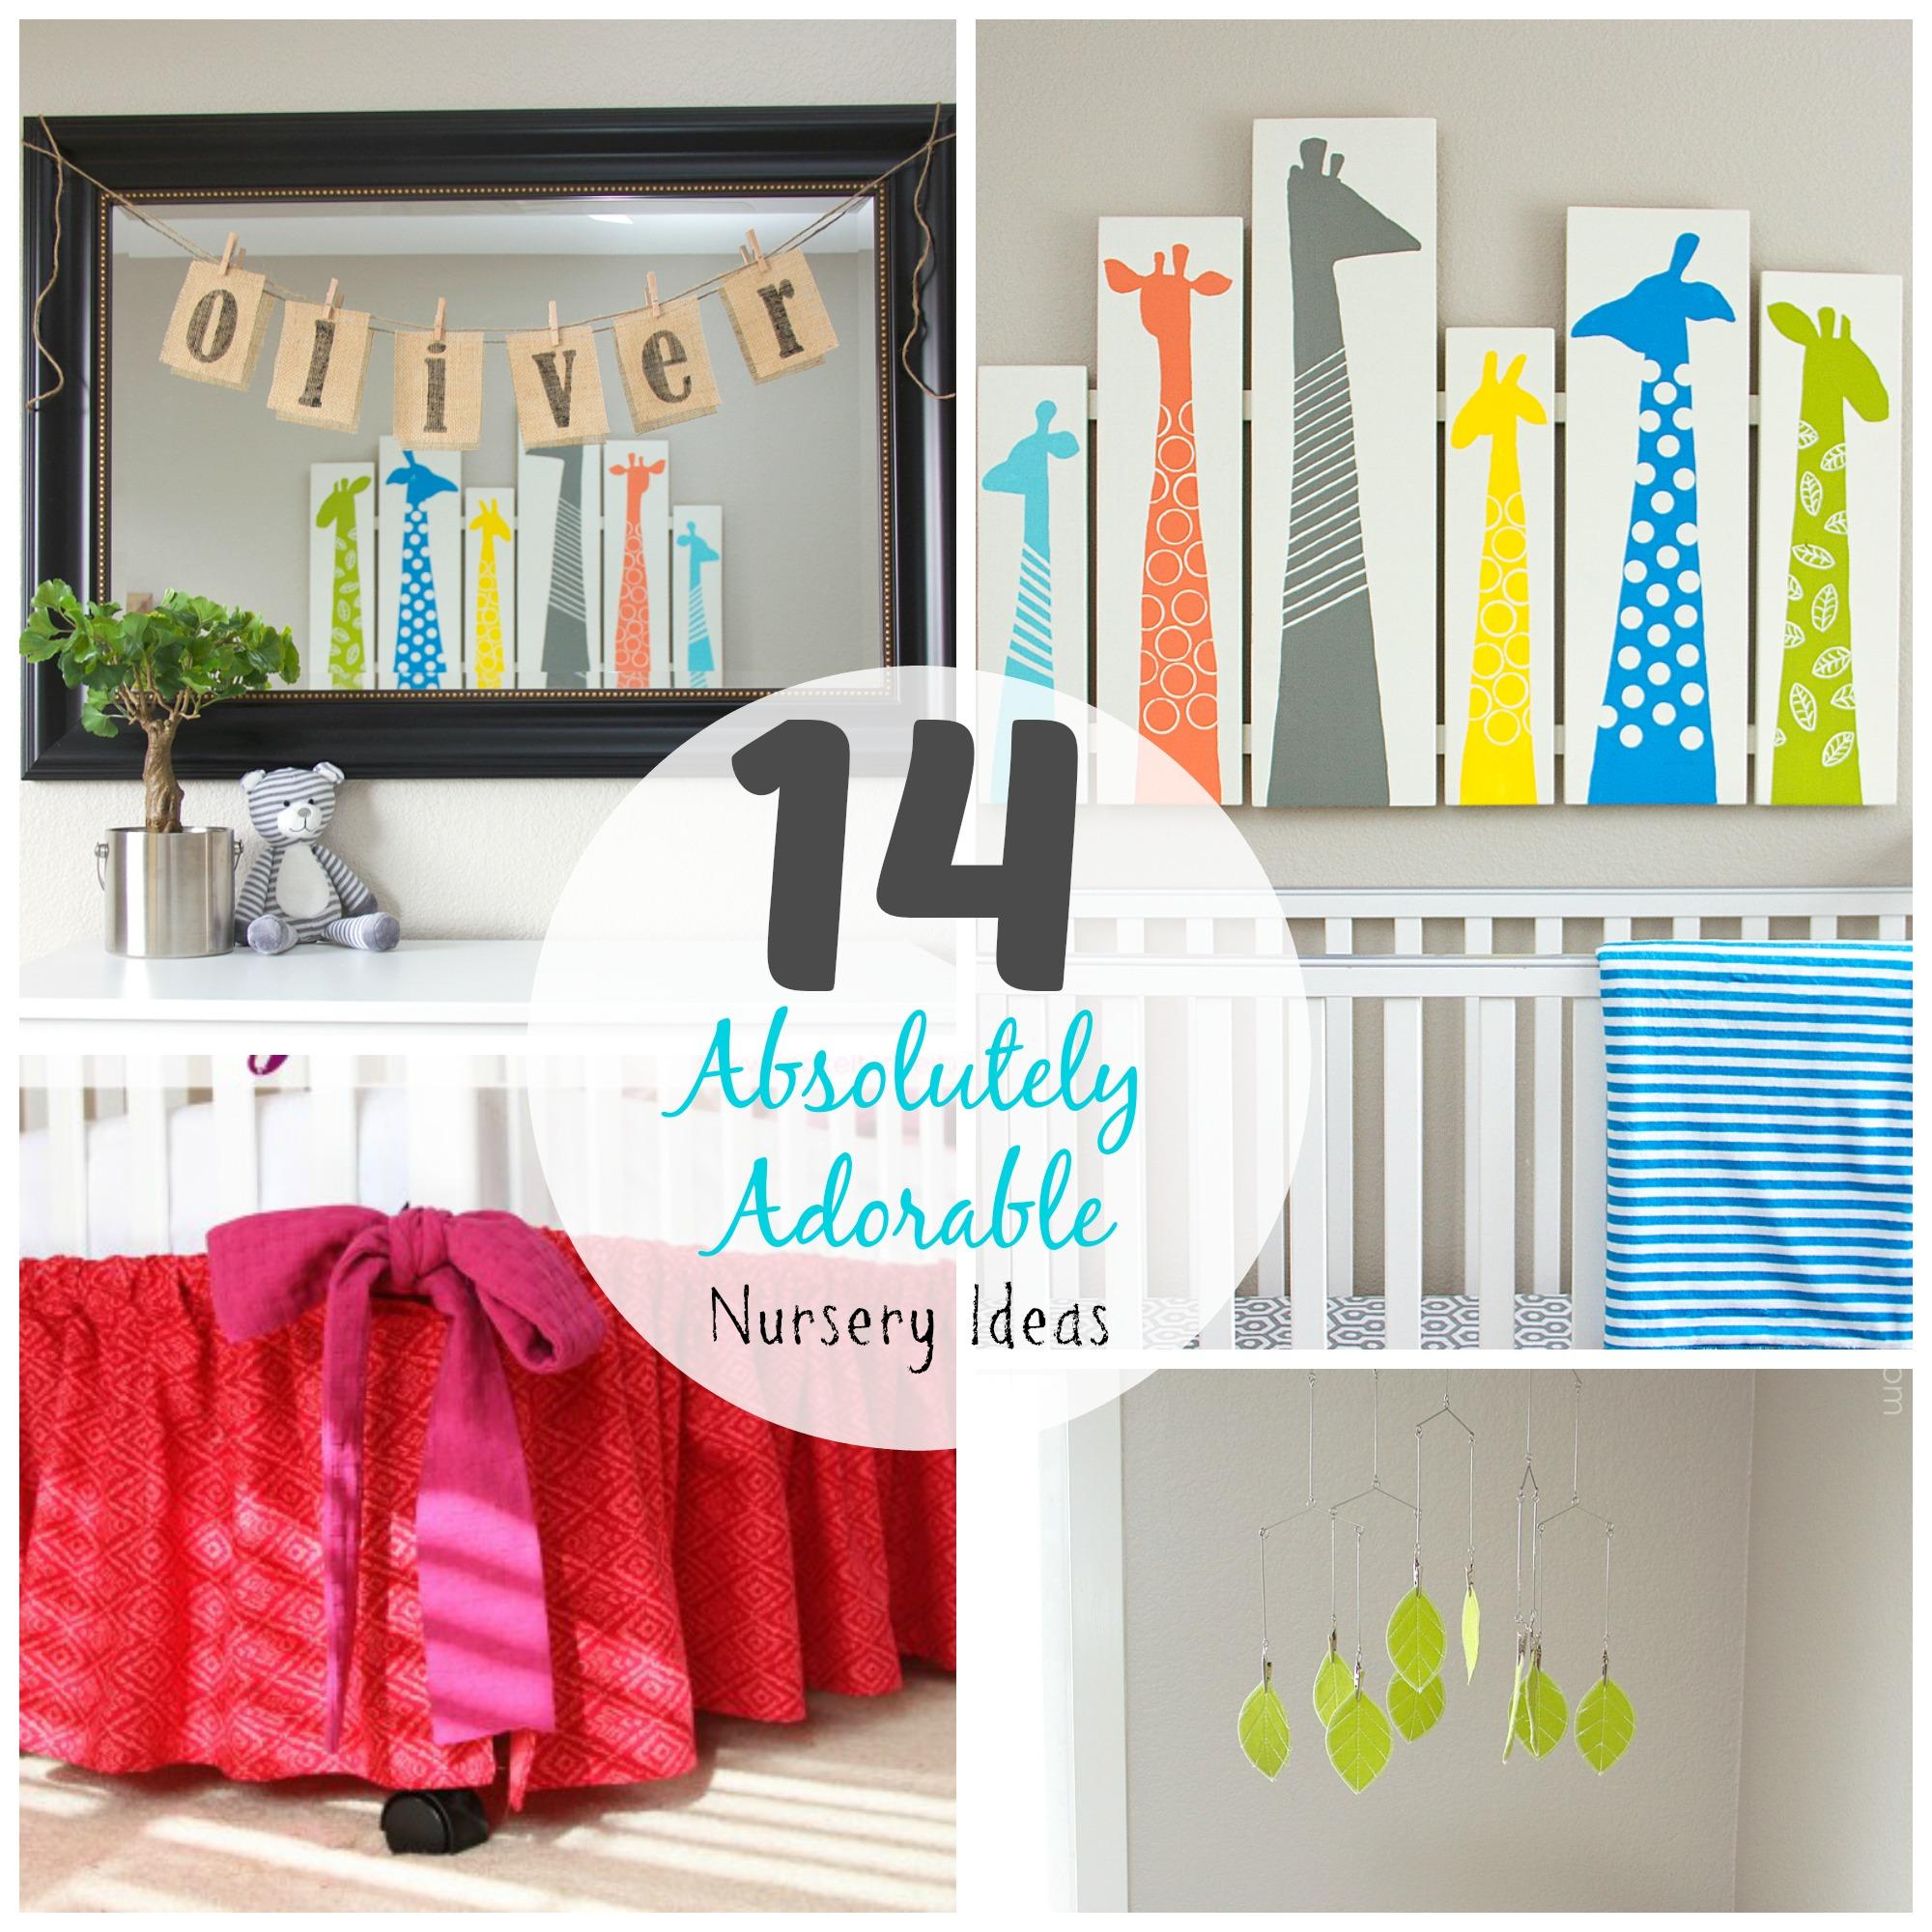 Adorable Nursery Idea: Adorable Nursery Ideas